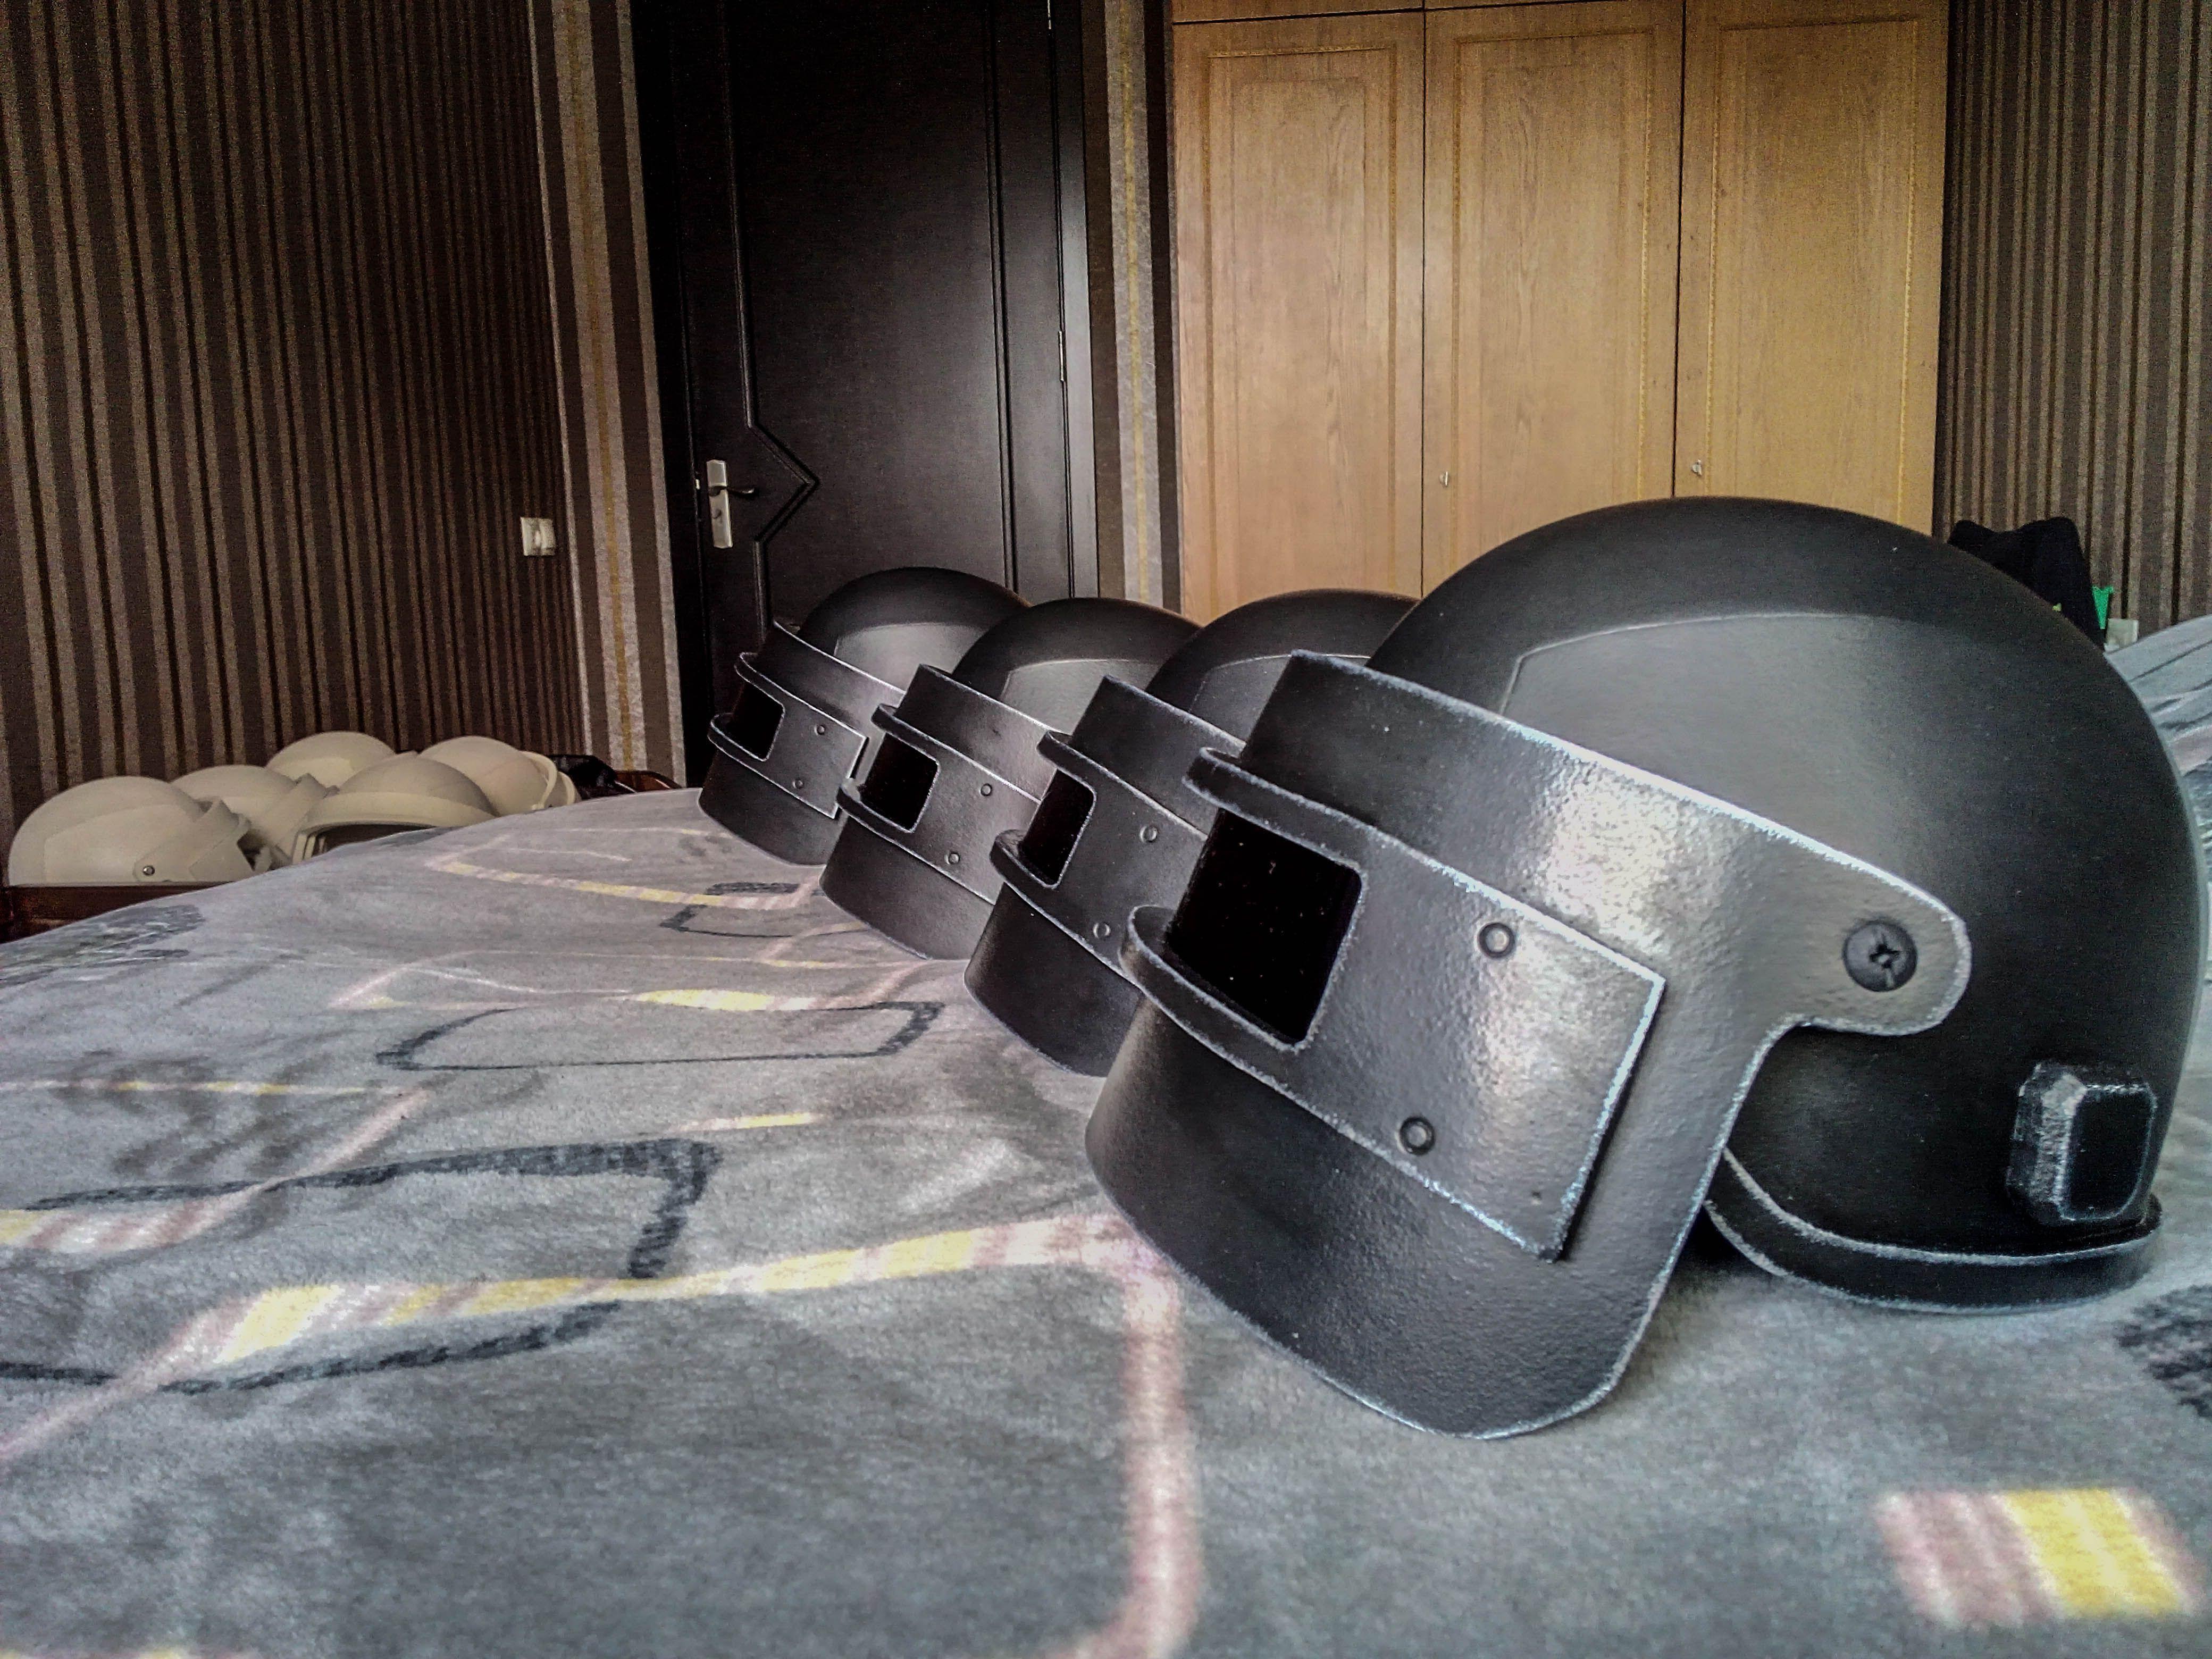 Pubg Level 3 Helmet Hd Wallpaper: PUBG Helmet Wallpapers